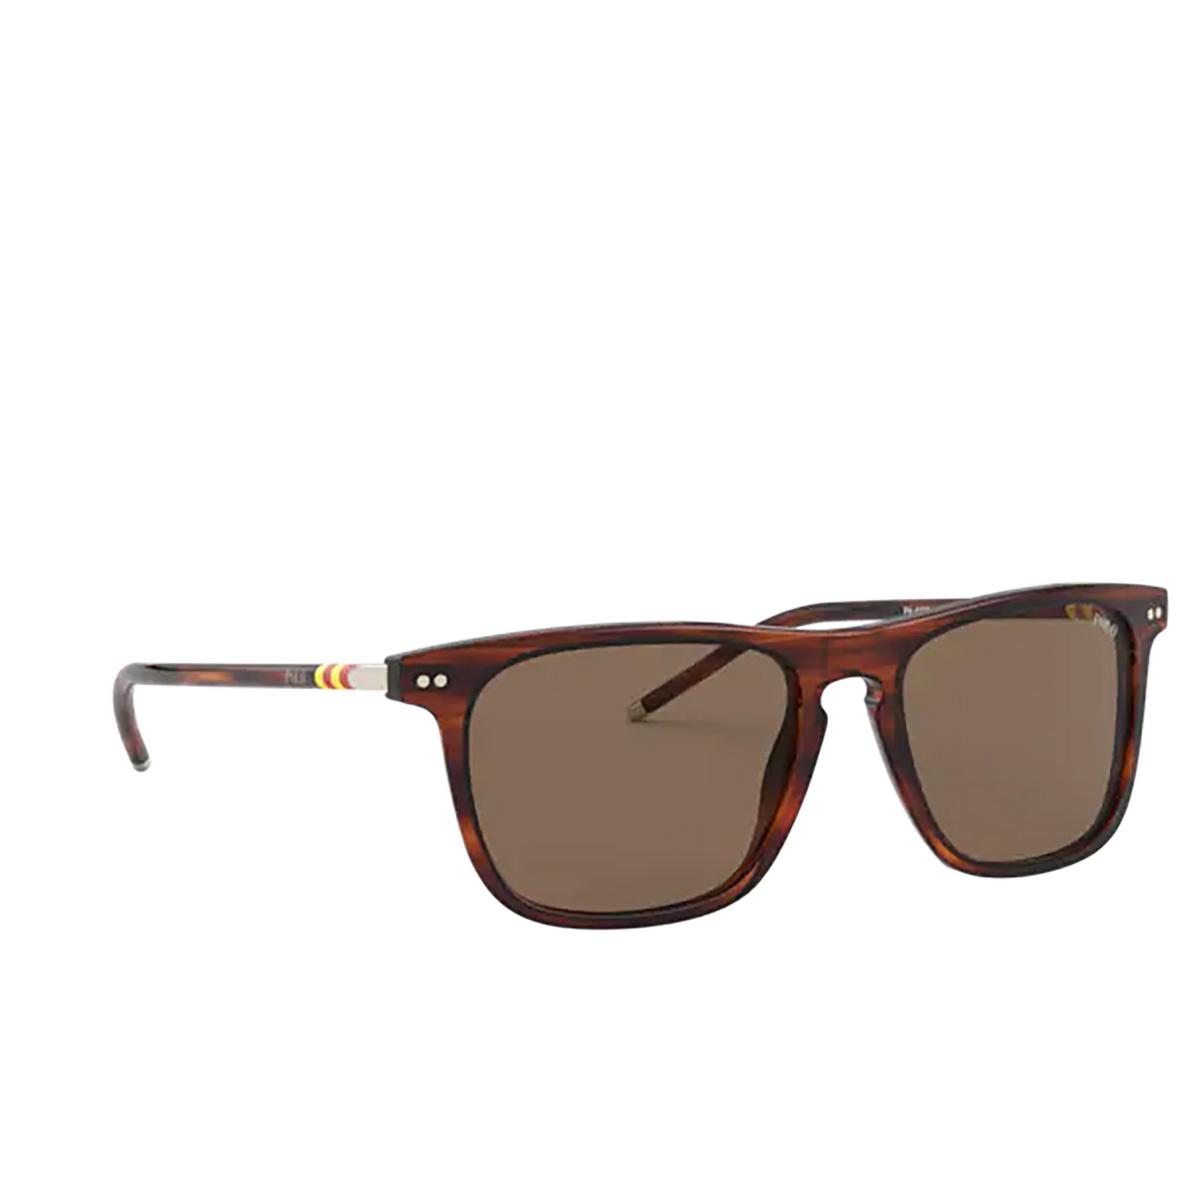 Polo Ralph Lauren® Square Sunglasses: PH4168 color Shiny Striped Havana 500773.